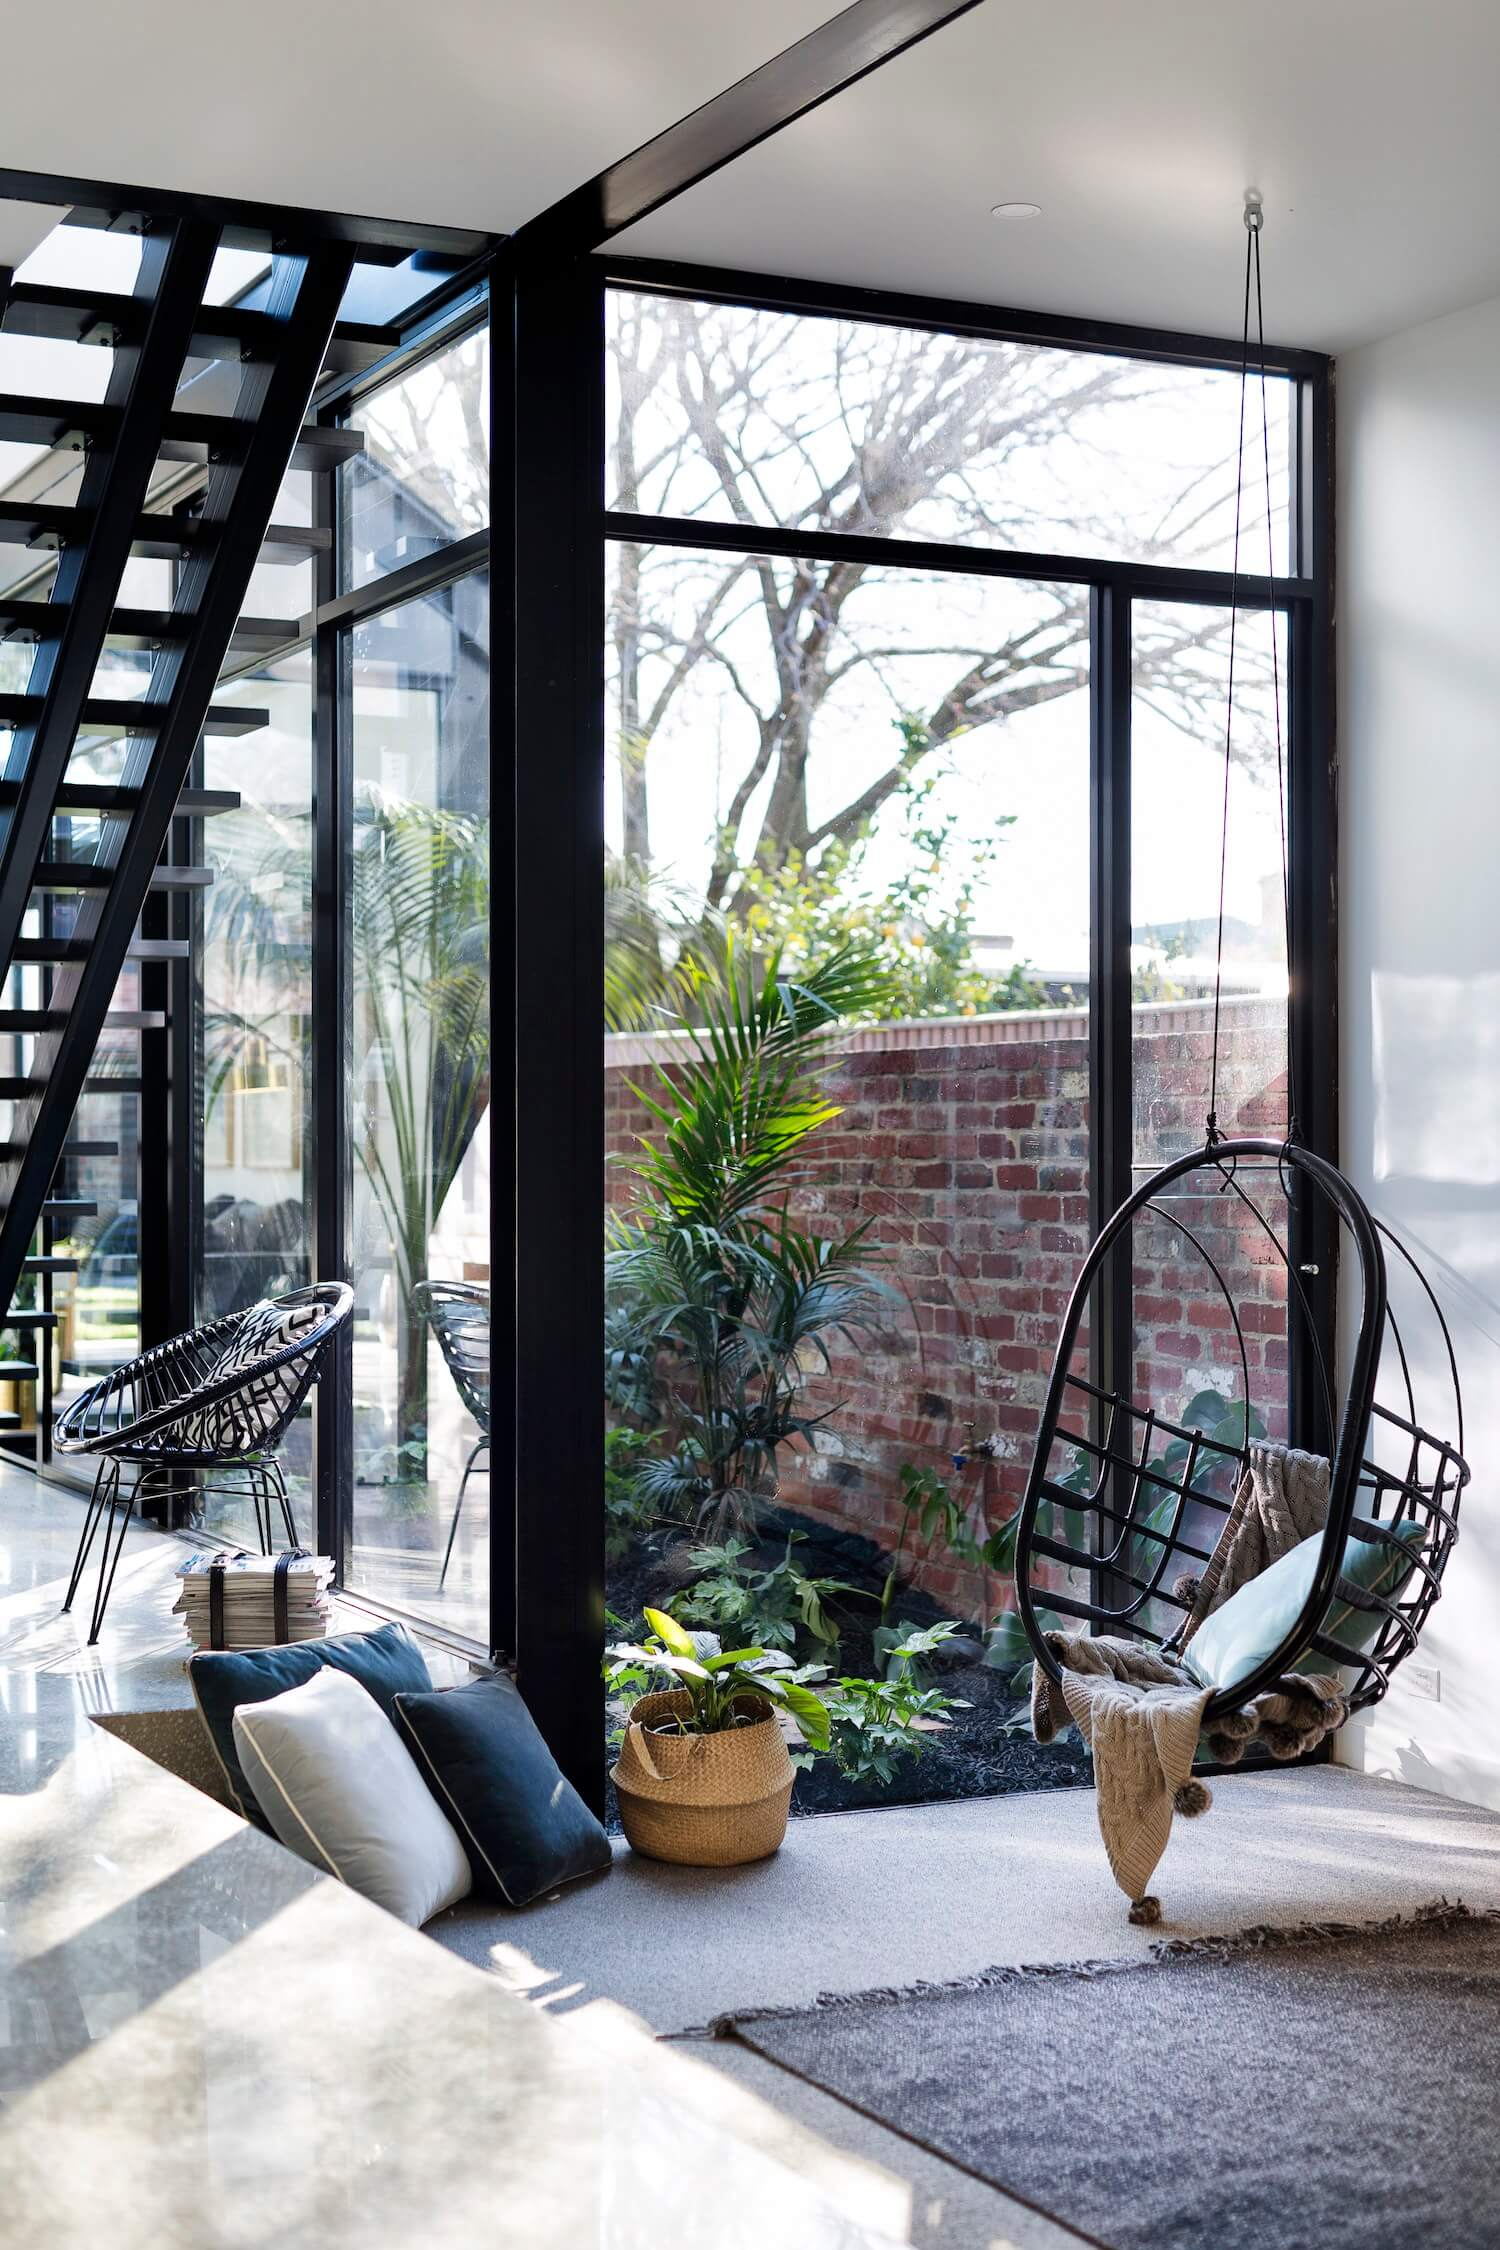 est living open house 71 cunningham street northcote 2